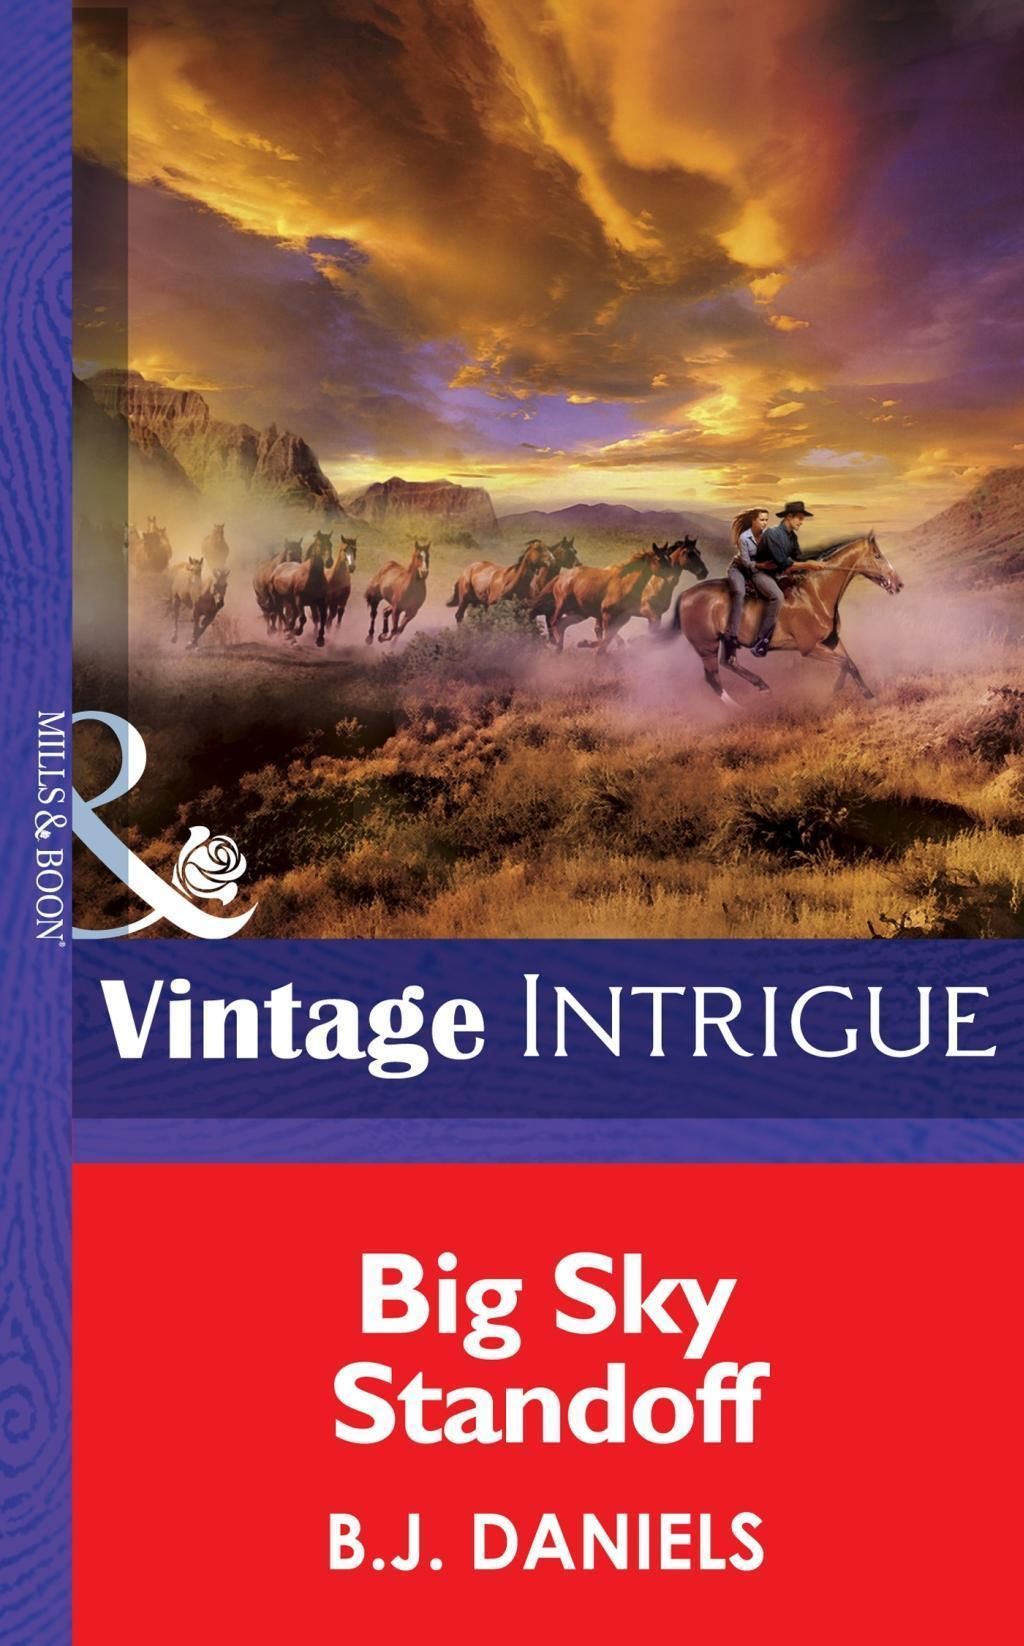 Big Sky Standoff (Mills & Boon Intrigue) (Montana Mystique, Book 3)